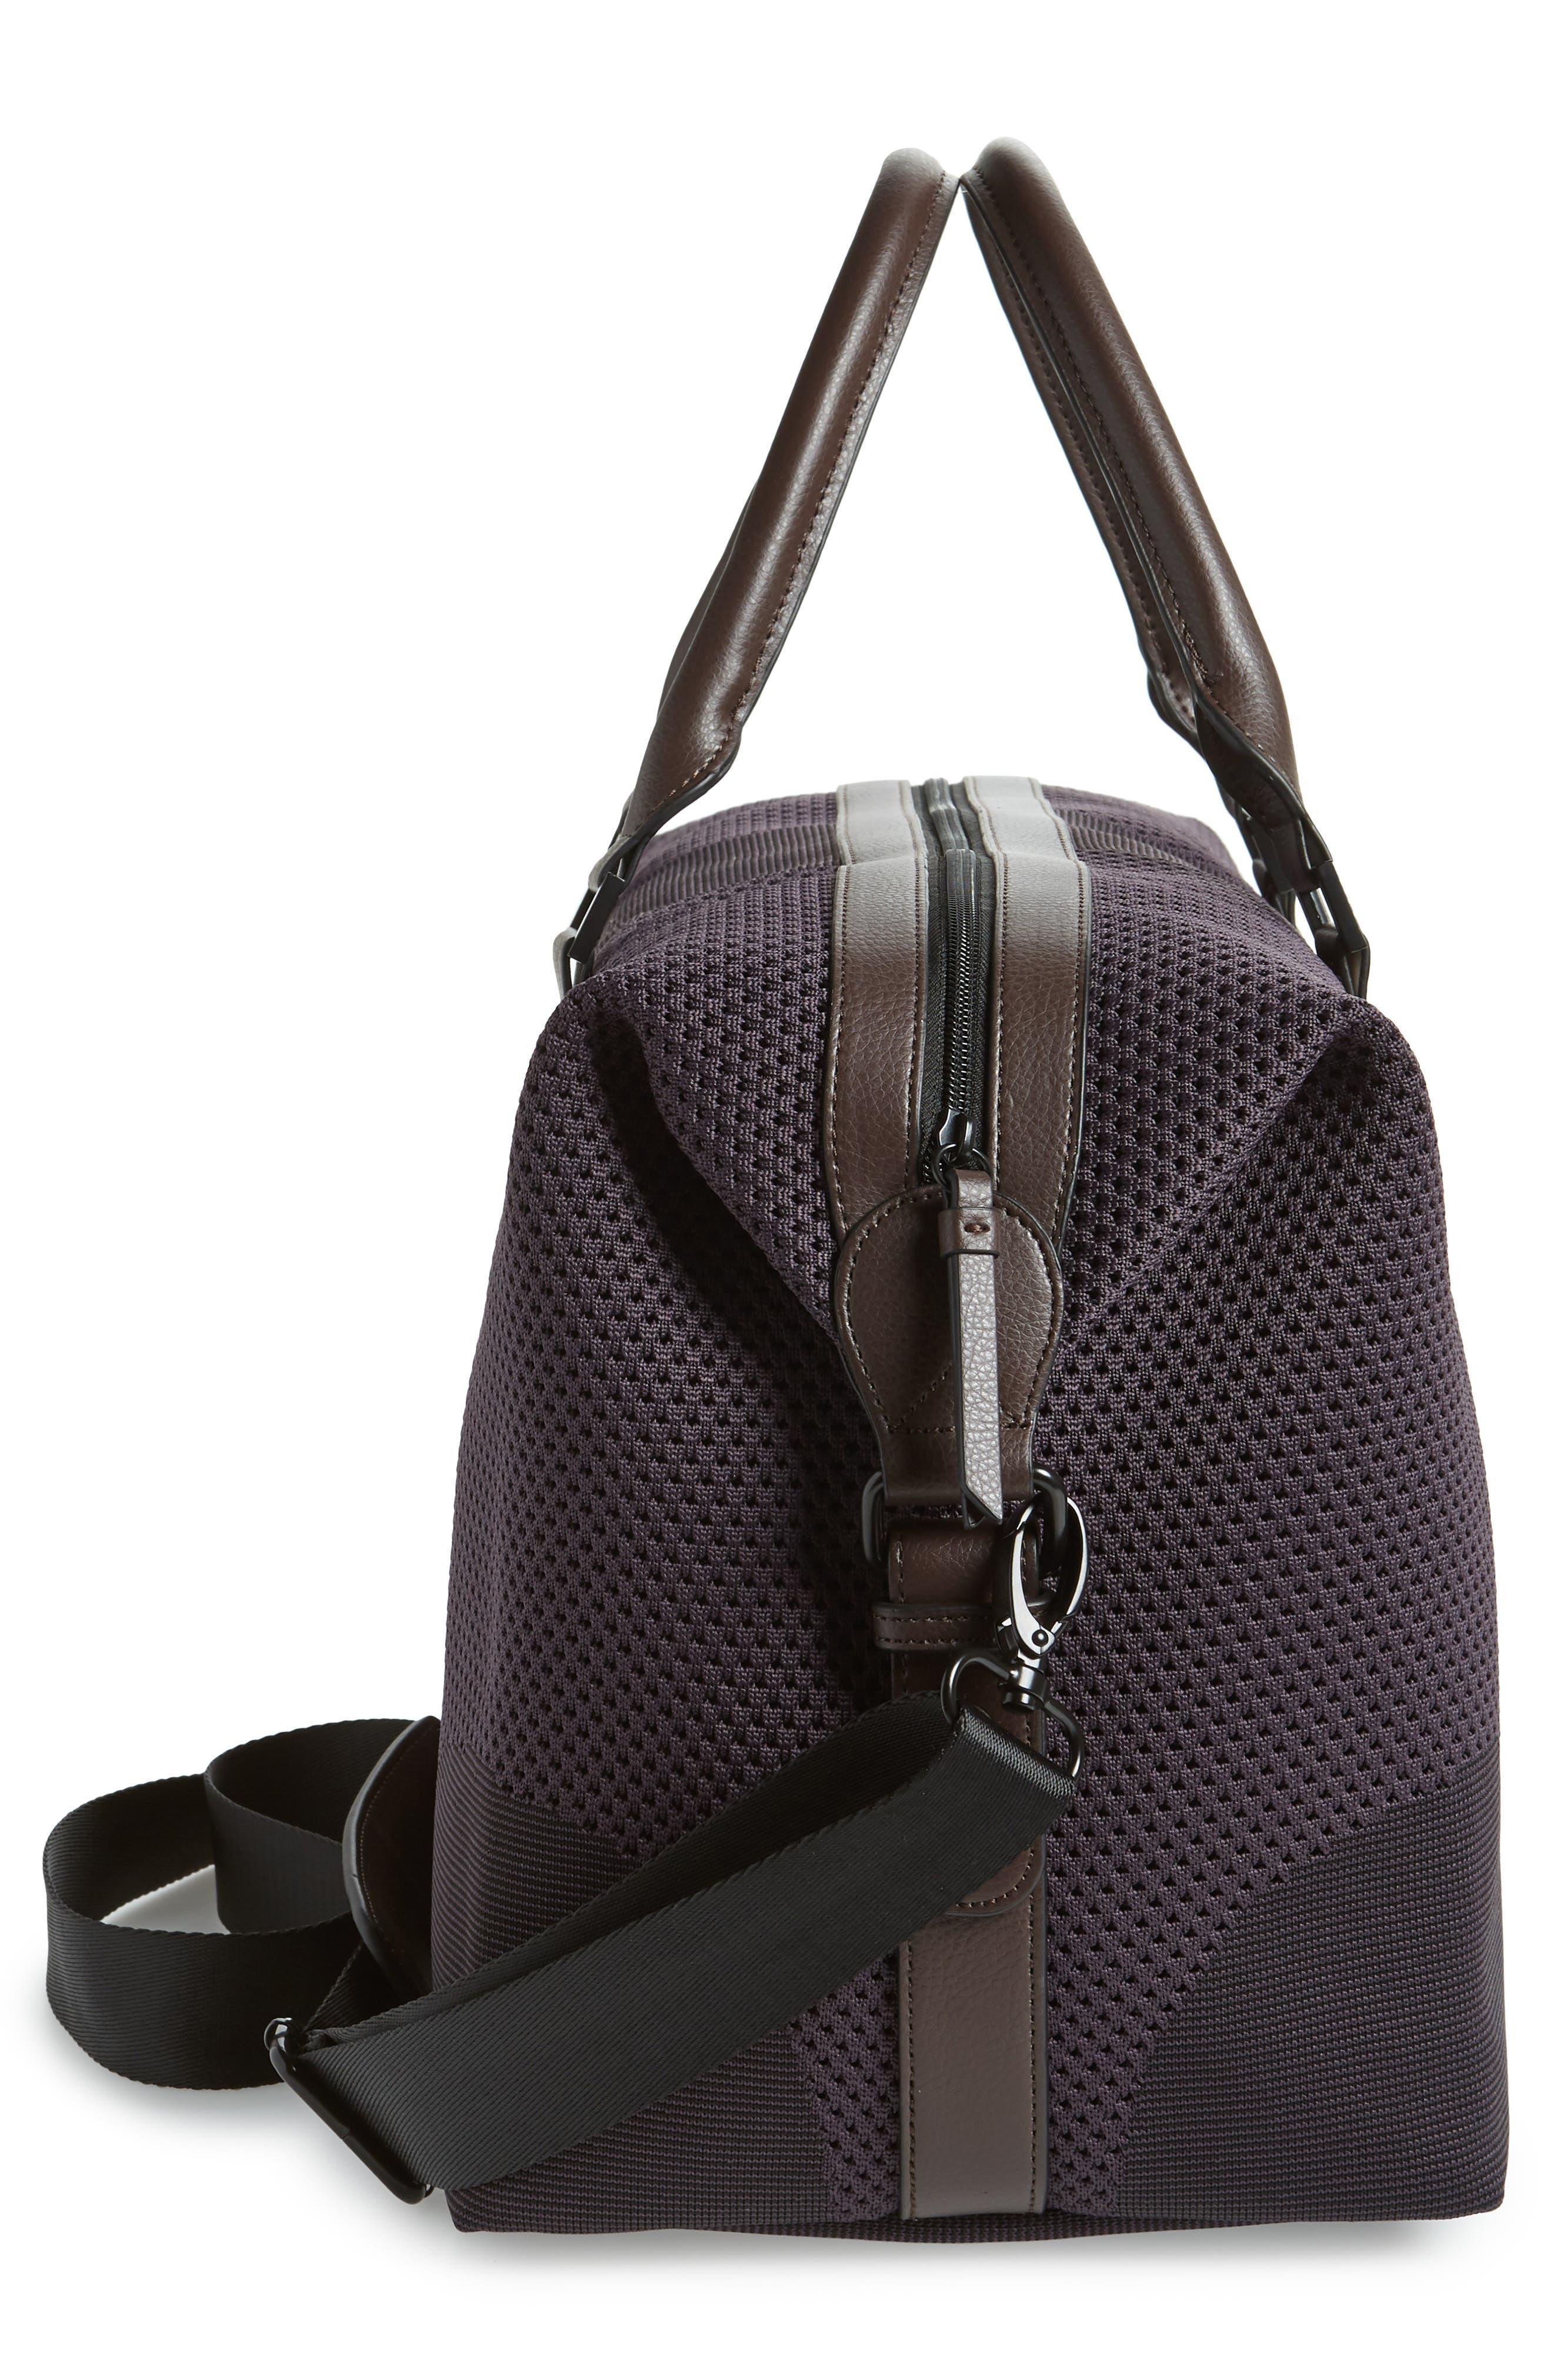 TED BAKER LONDON,                             Knit Holdall Duffel Bag,                             Alternate thumbnail 5, color,                             531